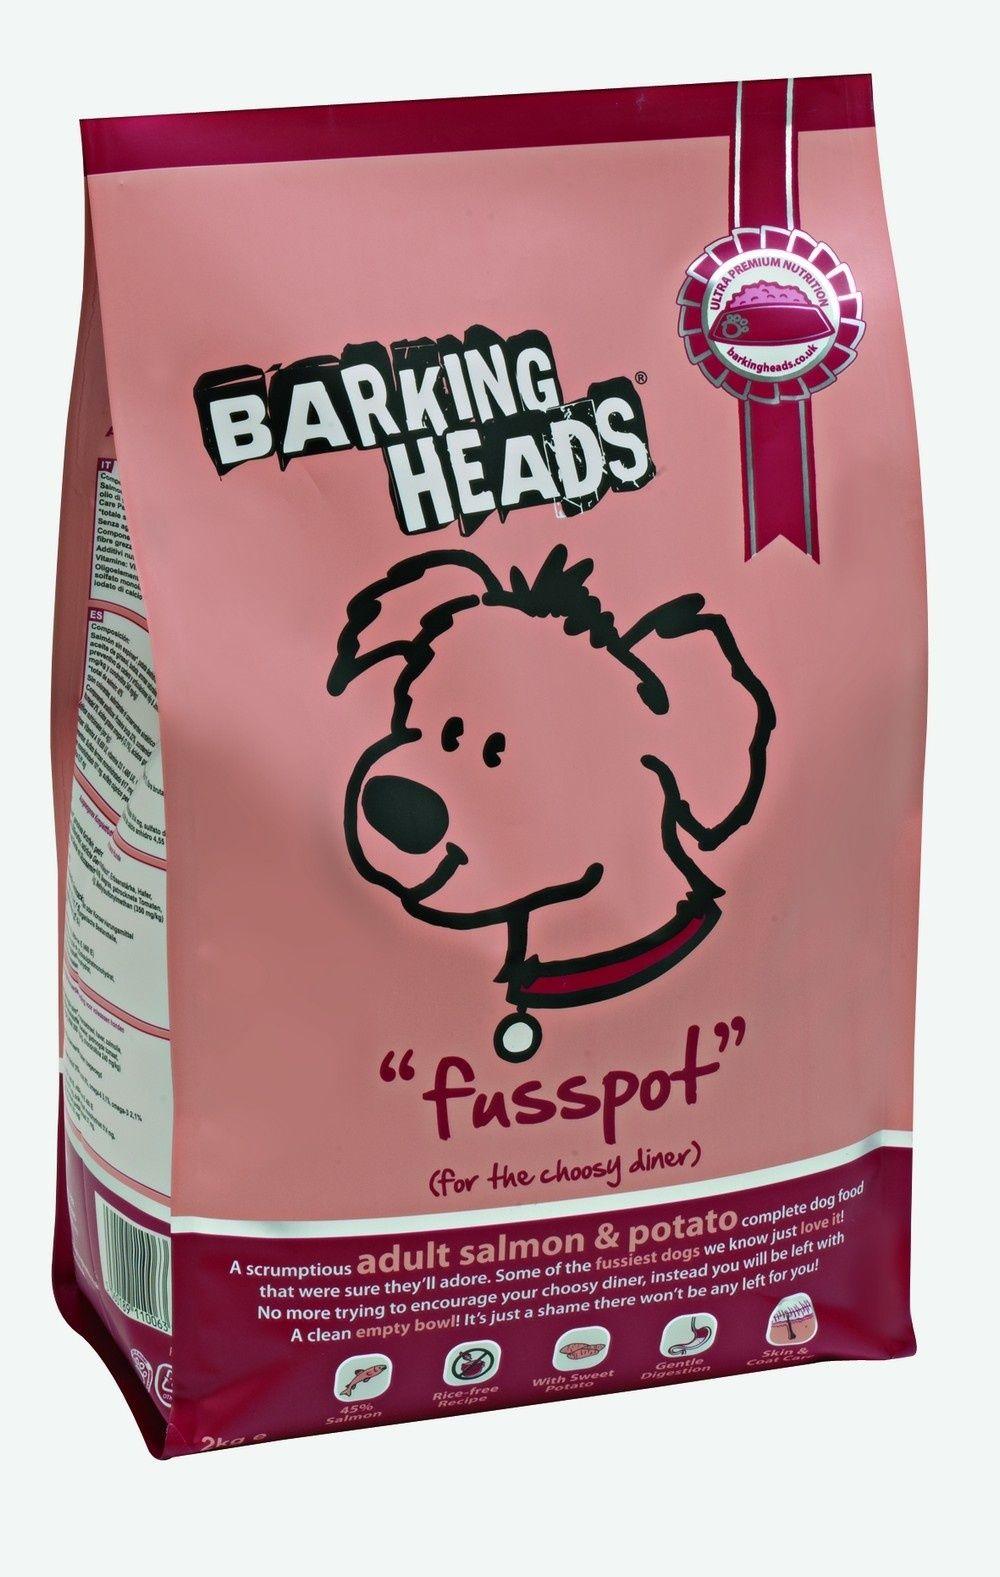 ���� Barking Heads ��� ����� � ������� � ���������� ����� ������ ����� 18�� - Barking Heads - Barking Heads������������ �����<br><br><br>�������: 18114<br>�����: Barking Heads<br>���: �����<br>������ �������� (��): 0,12<br>����� �������� (��): 0,84<br>������ �������� (��): 0,38<br>��� ������ (��): 18<br>������-������������: ��������������<br>��� �������� (��): 18<br>������/������: ���<br>�����������: ������<br>��� ����: ������